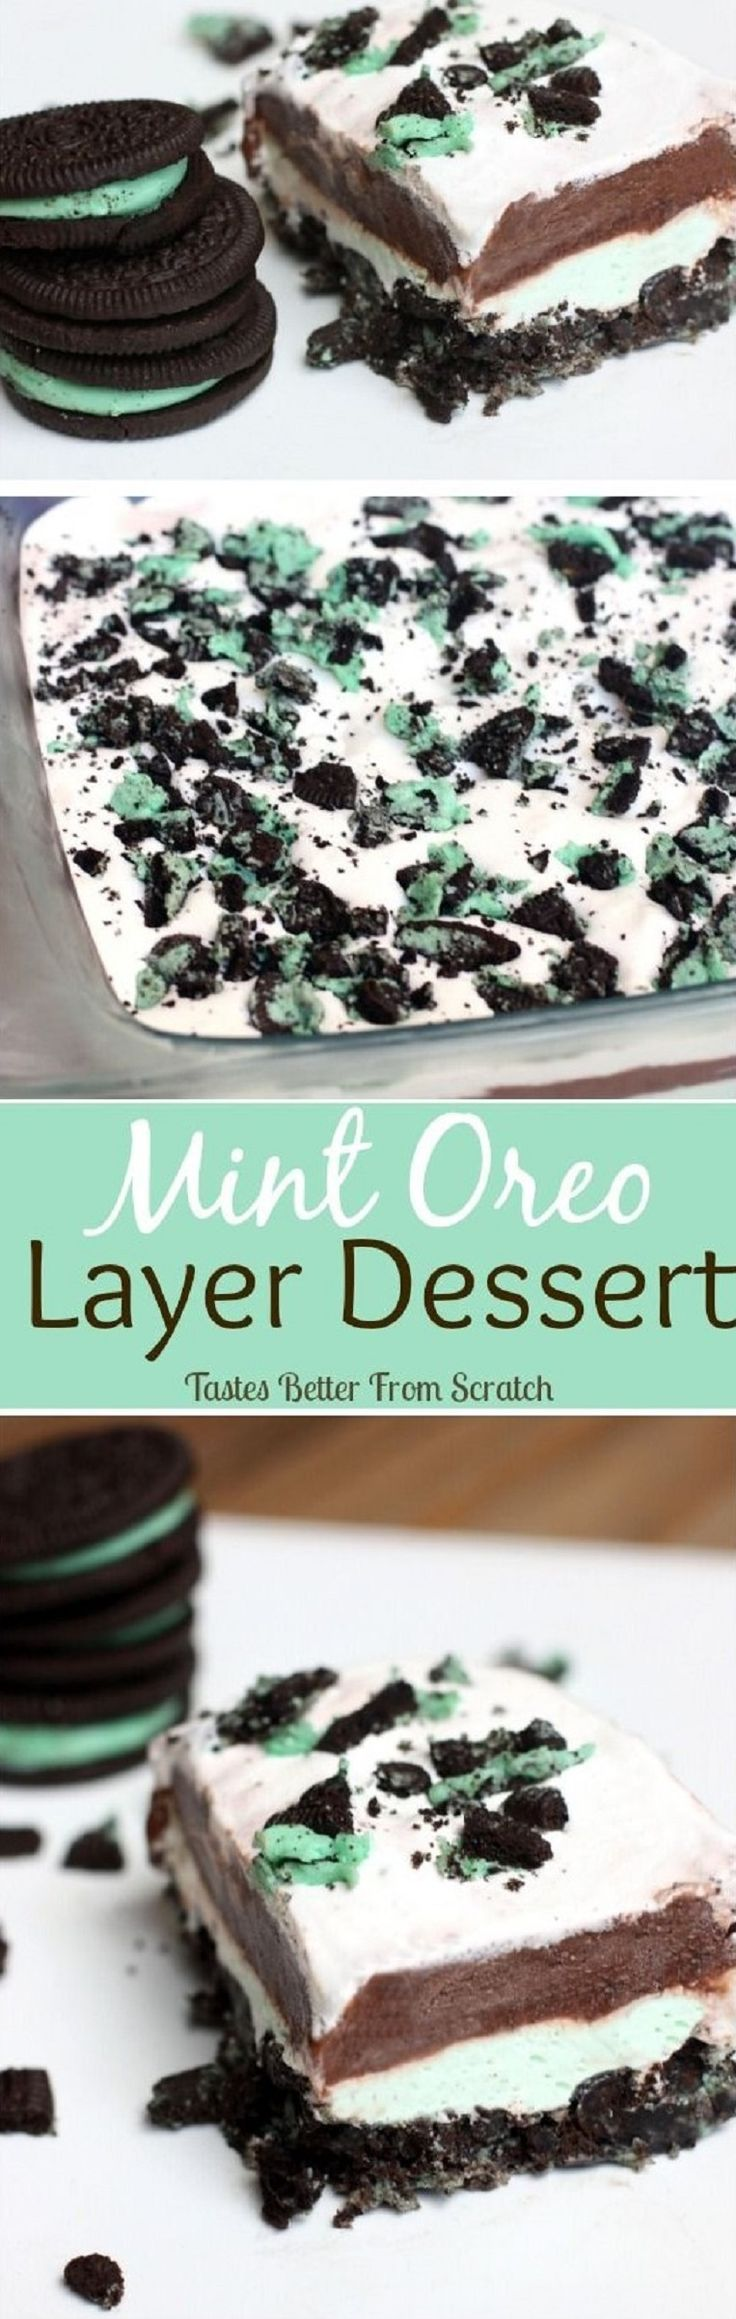 Mint Oreo Layer Dessert - 16 Divine Oreo Desserts   GleamItUp